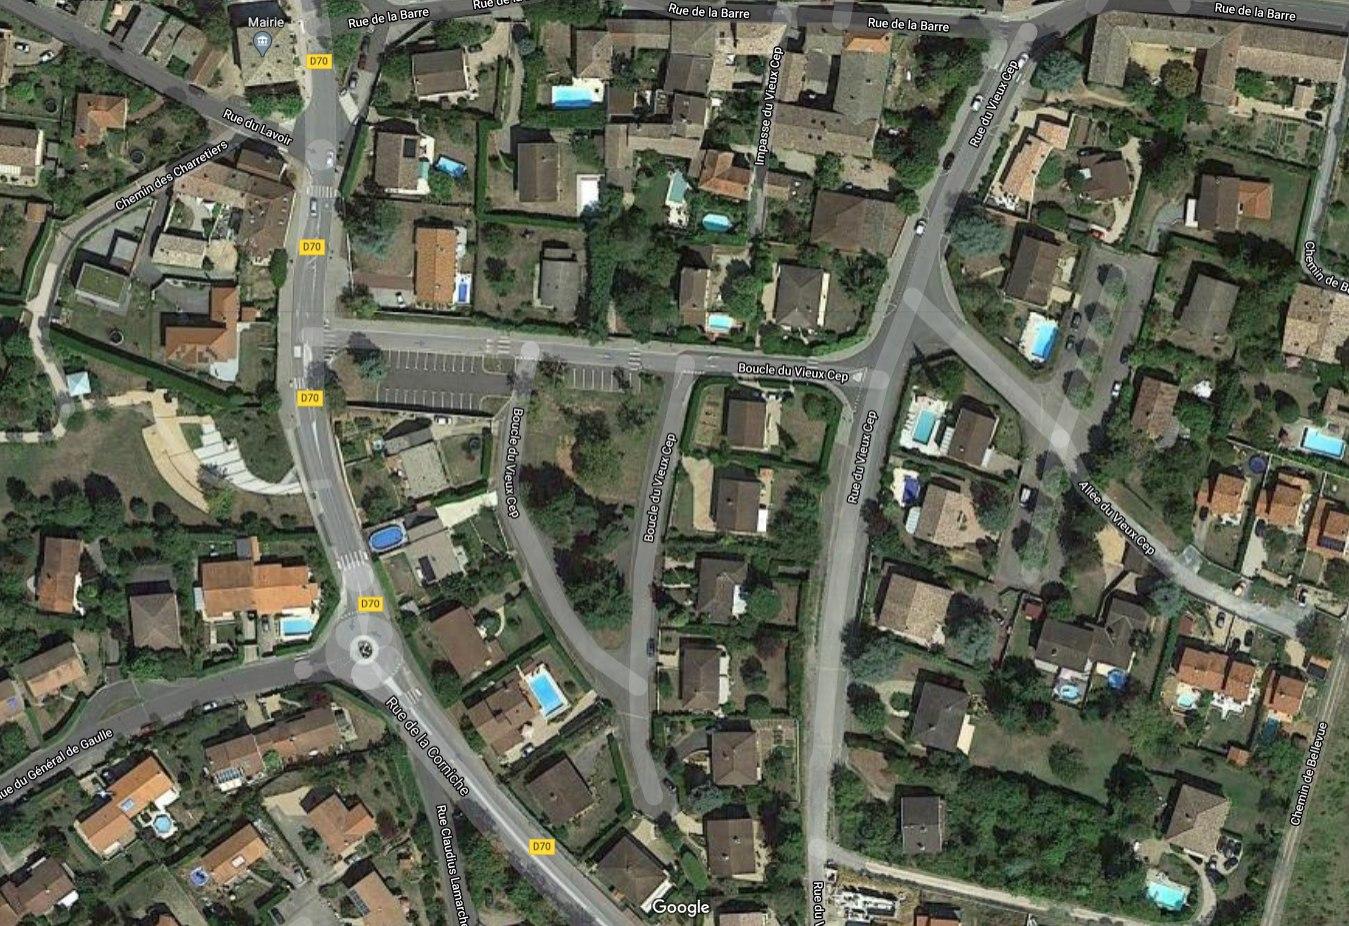 Logement - photo satellite.jpg